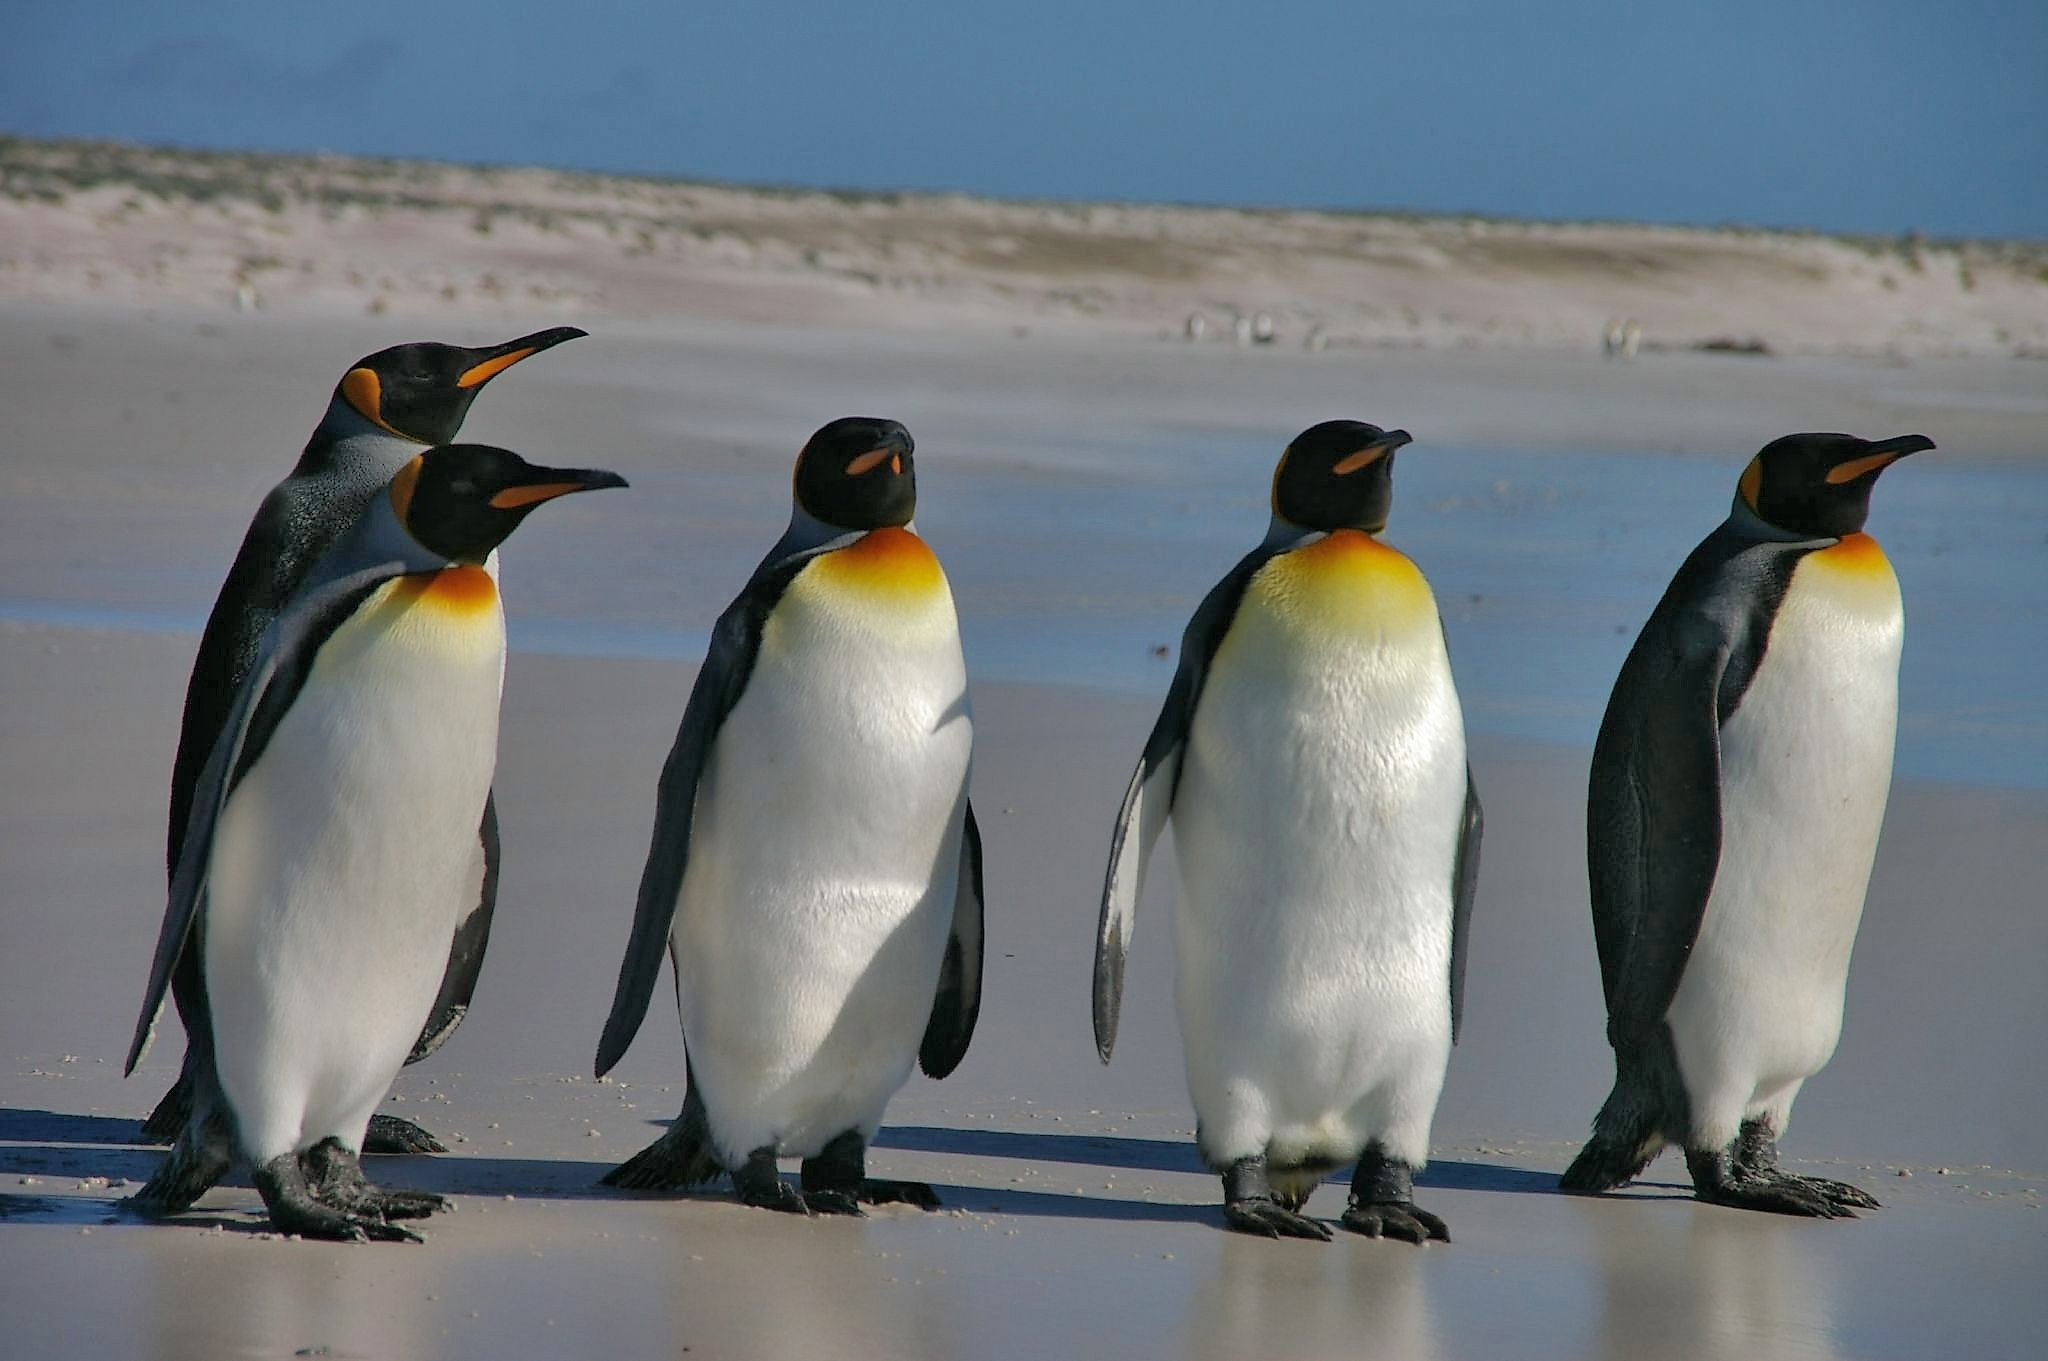 Penguins - Sudo upgrade the micro-application immediately